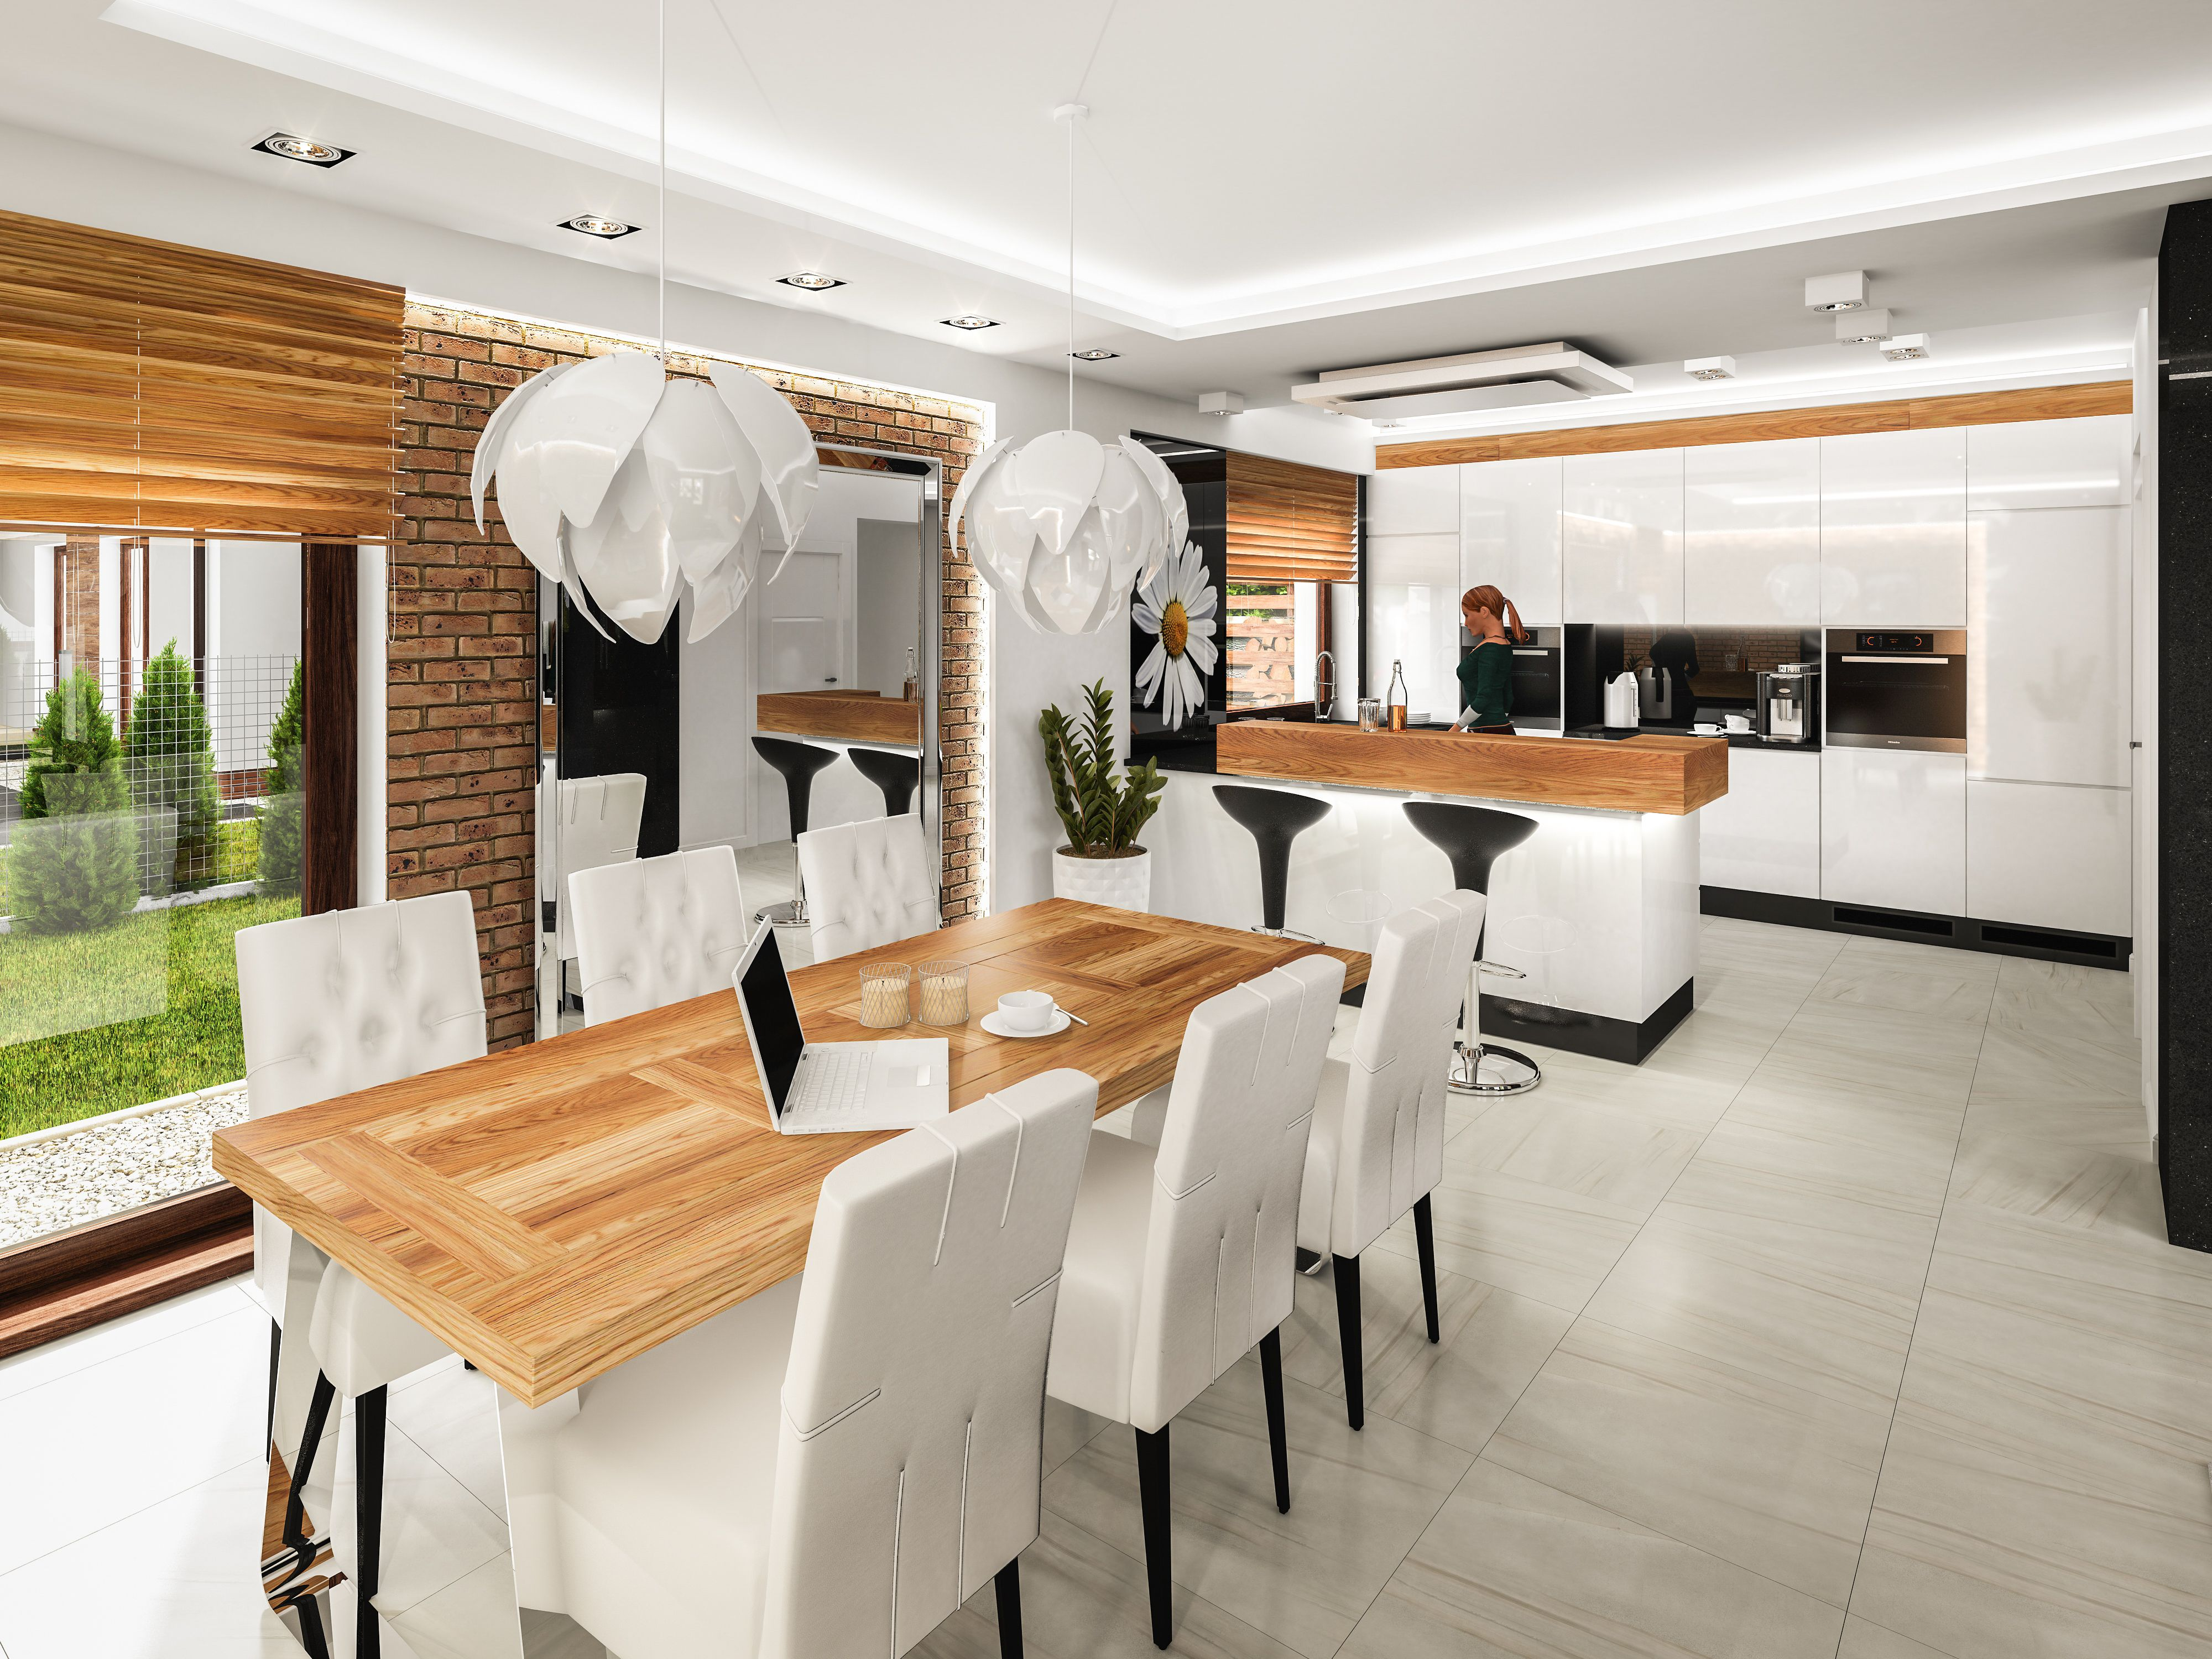 Martines Pila Pl Jadalnia Z Otwarta Kuchnia Decor Home Home Decor